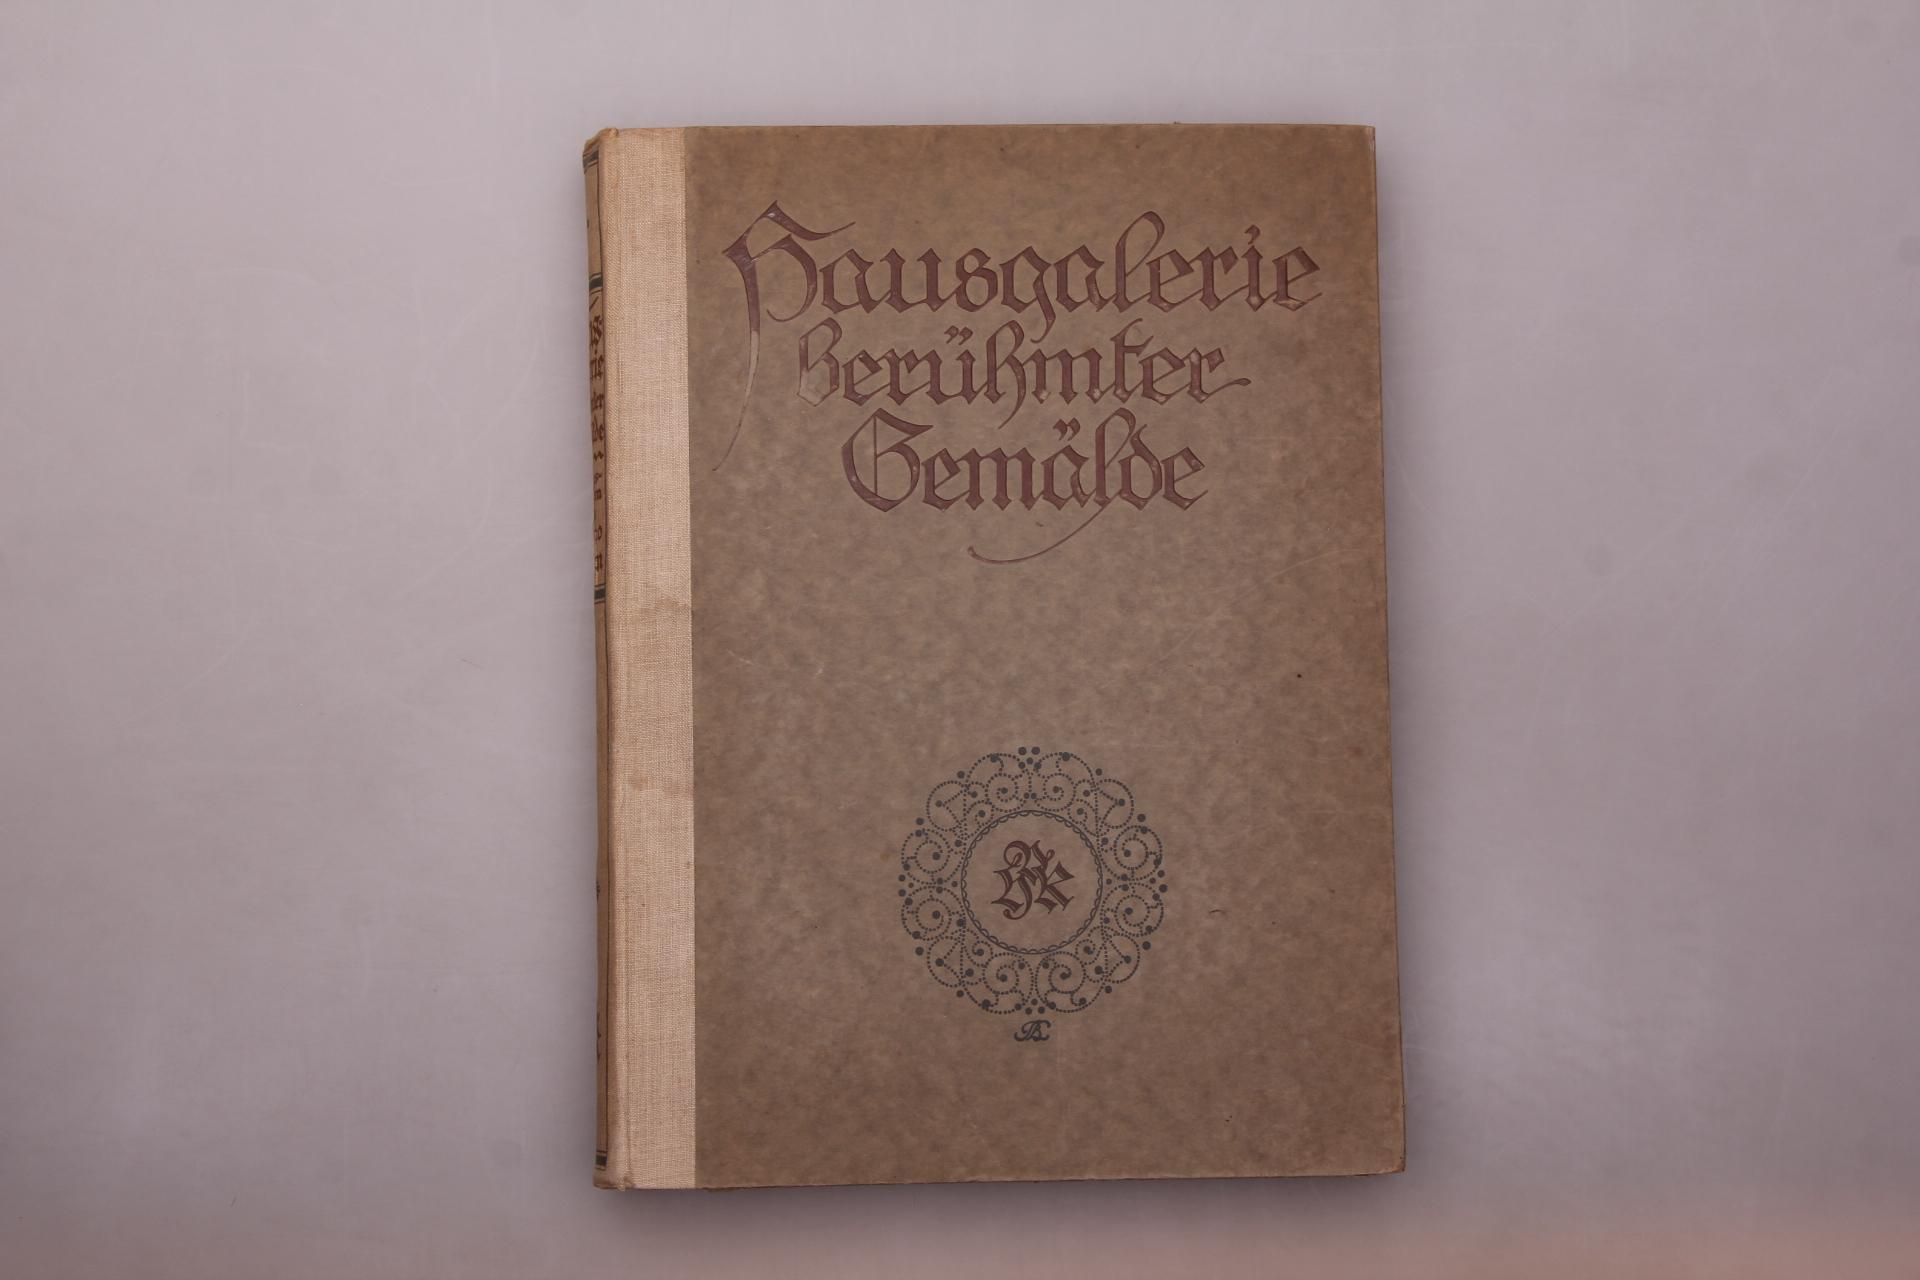 HAUSGALERIE BERÜHMTER GEMÄLDE